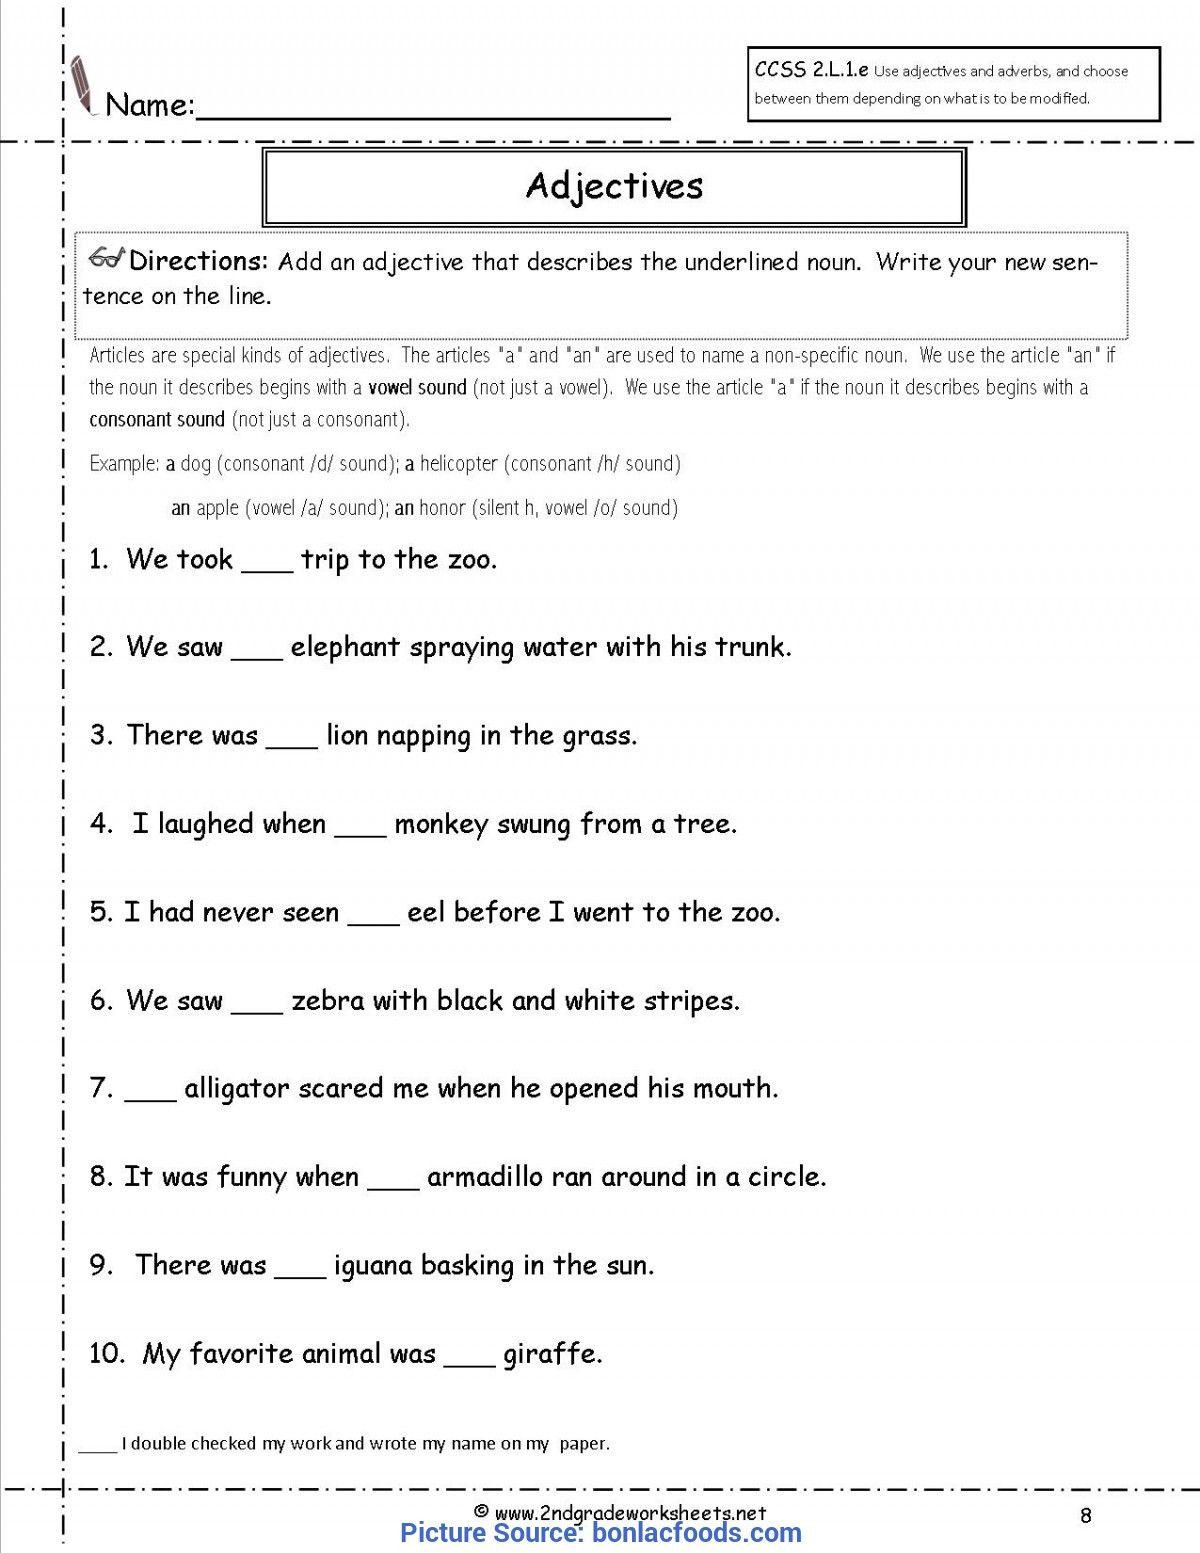 Free Printable Adjective Worksheets Valuable 2nd Grade Lesson Plans Adjectives Worksheet In 2020 2nd Grade Worksheets Grammar Worksheets Third Grade Grammar Worksheets